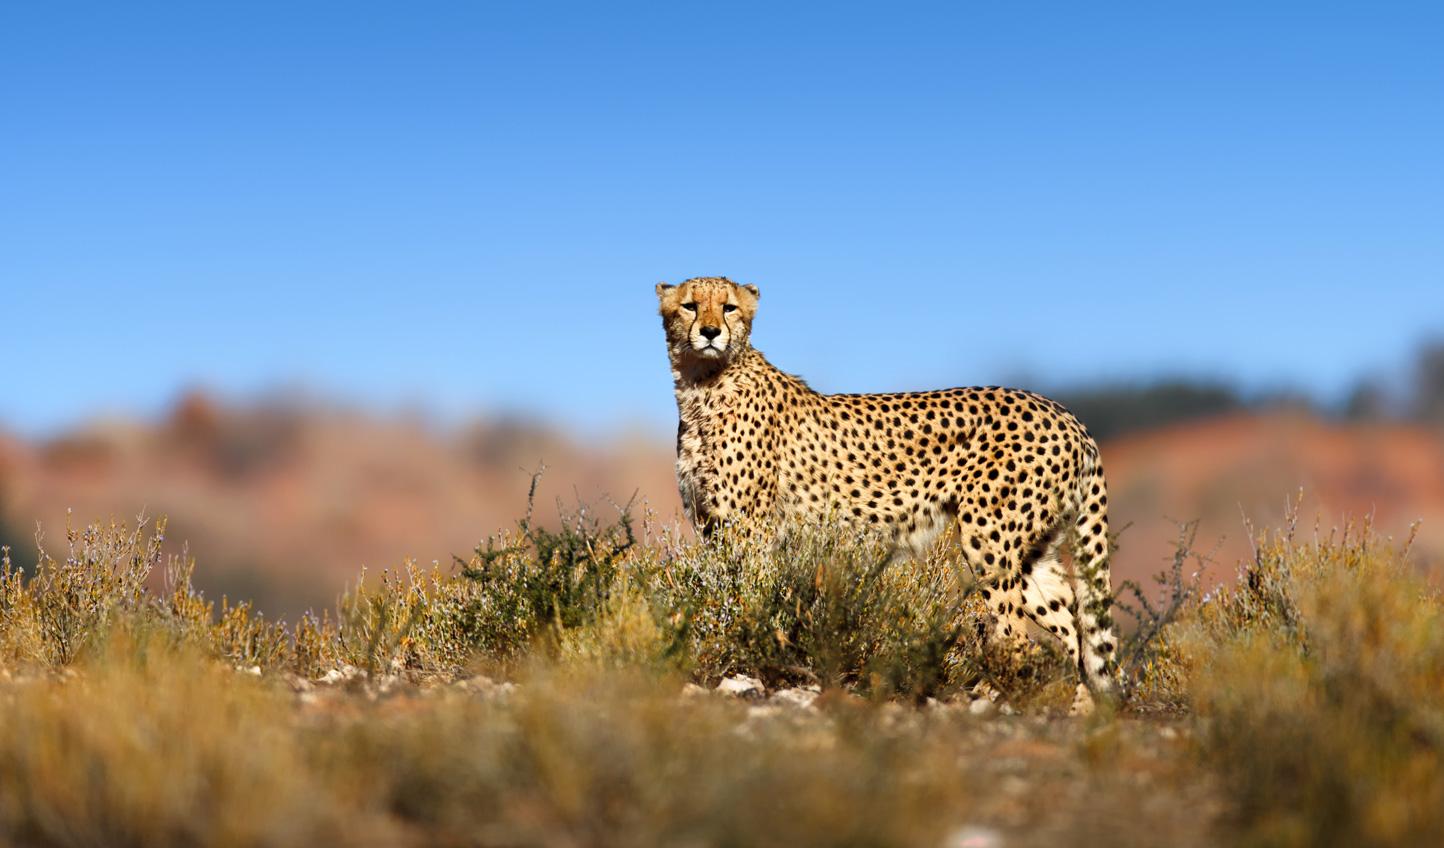 Spot cheetahs out on the Kalahari